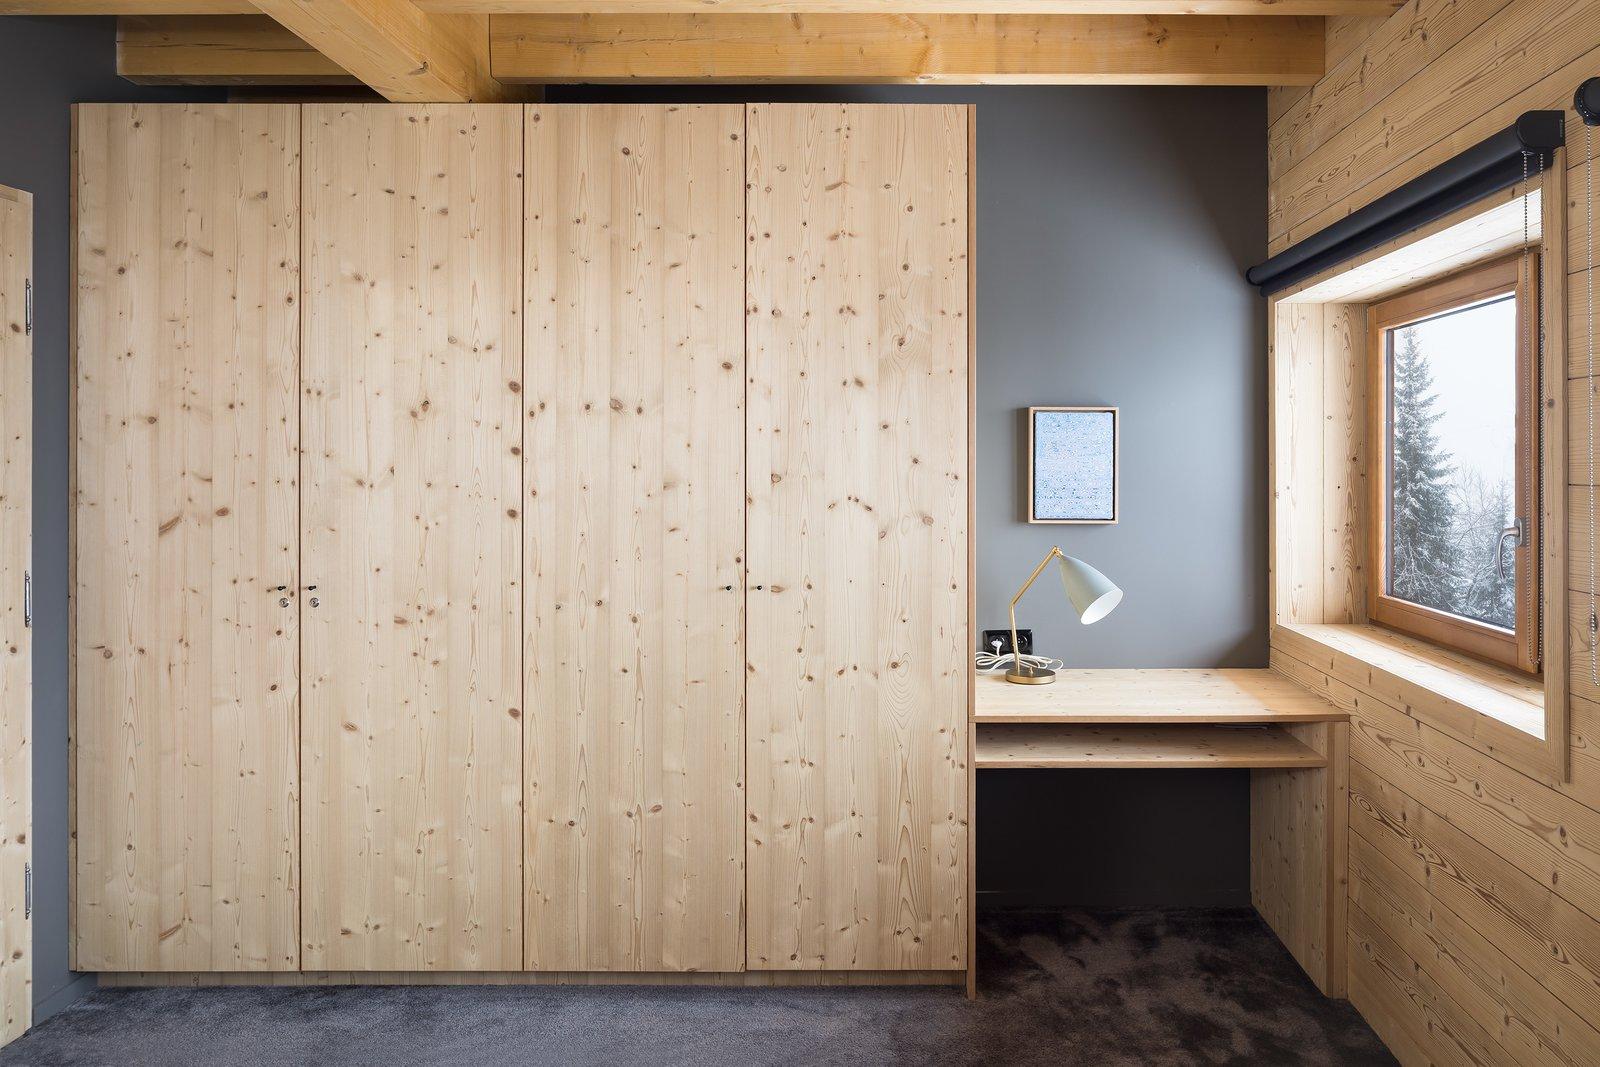 Bedroom, Wardrobe, Table Lighting, and Carpet Floor  Mountain House